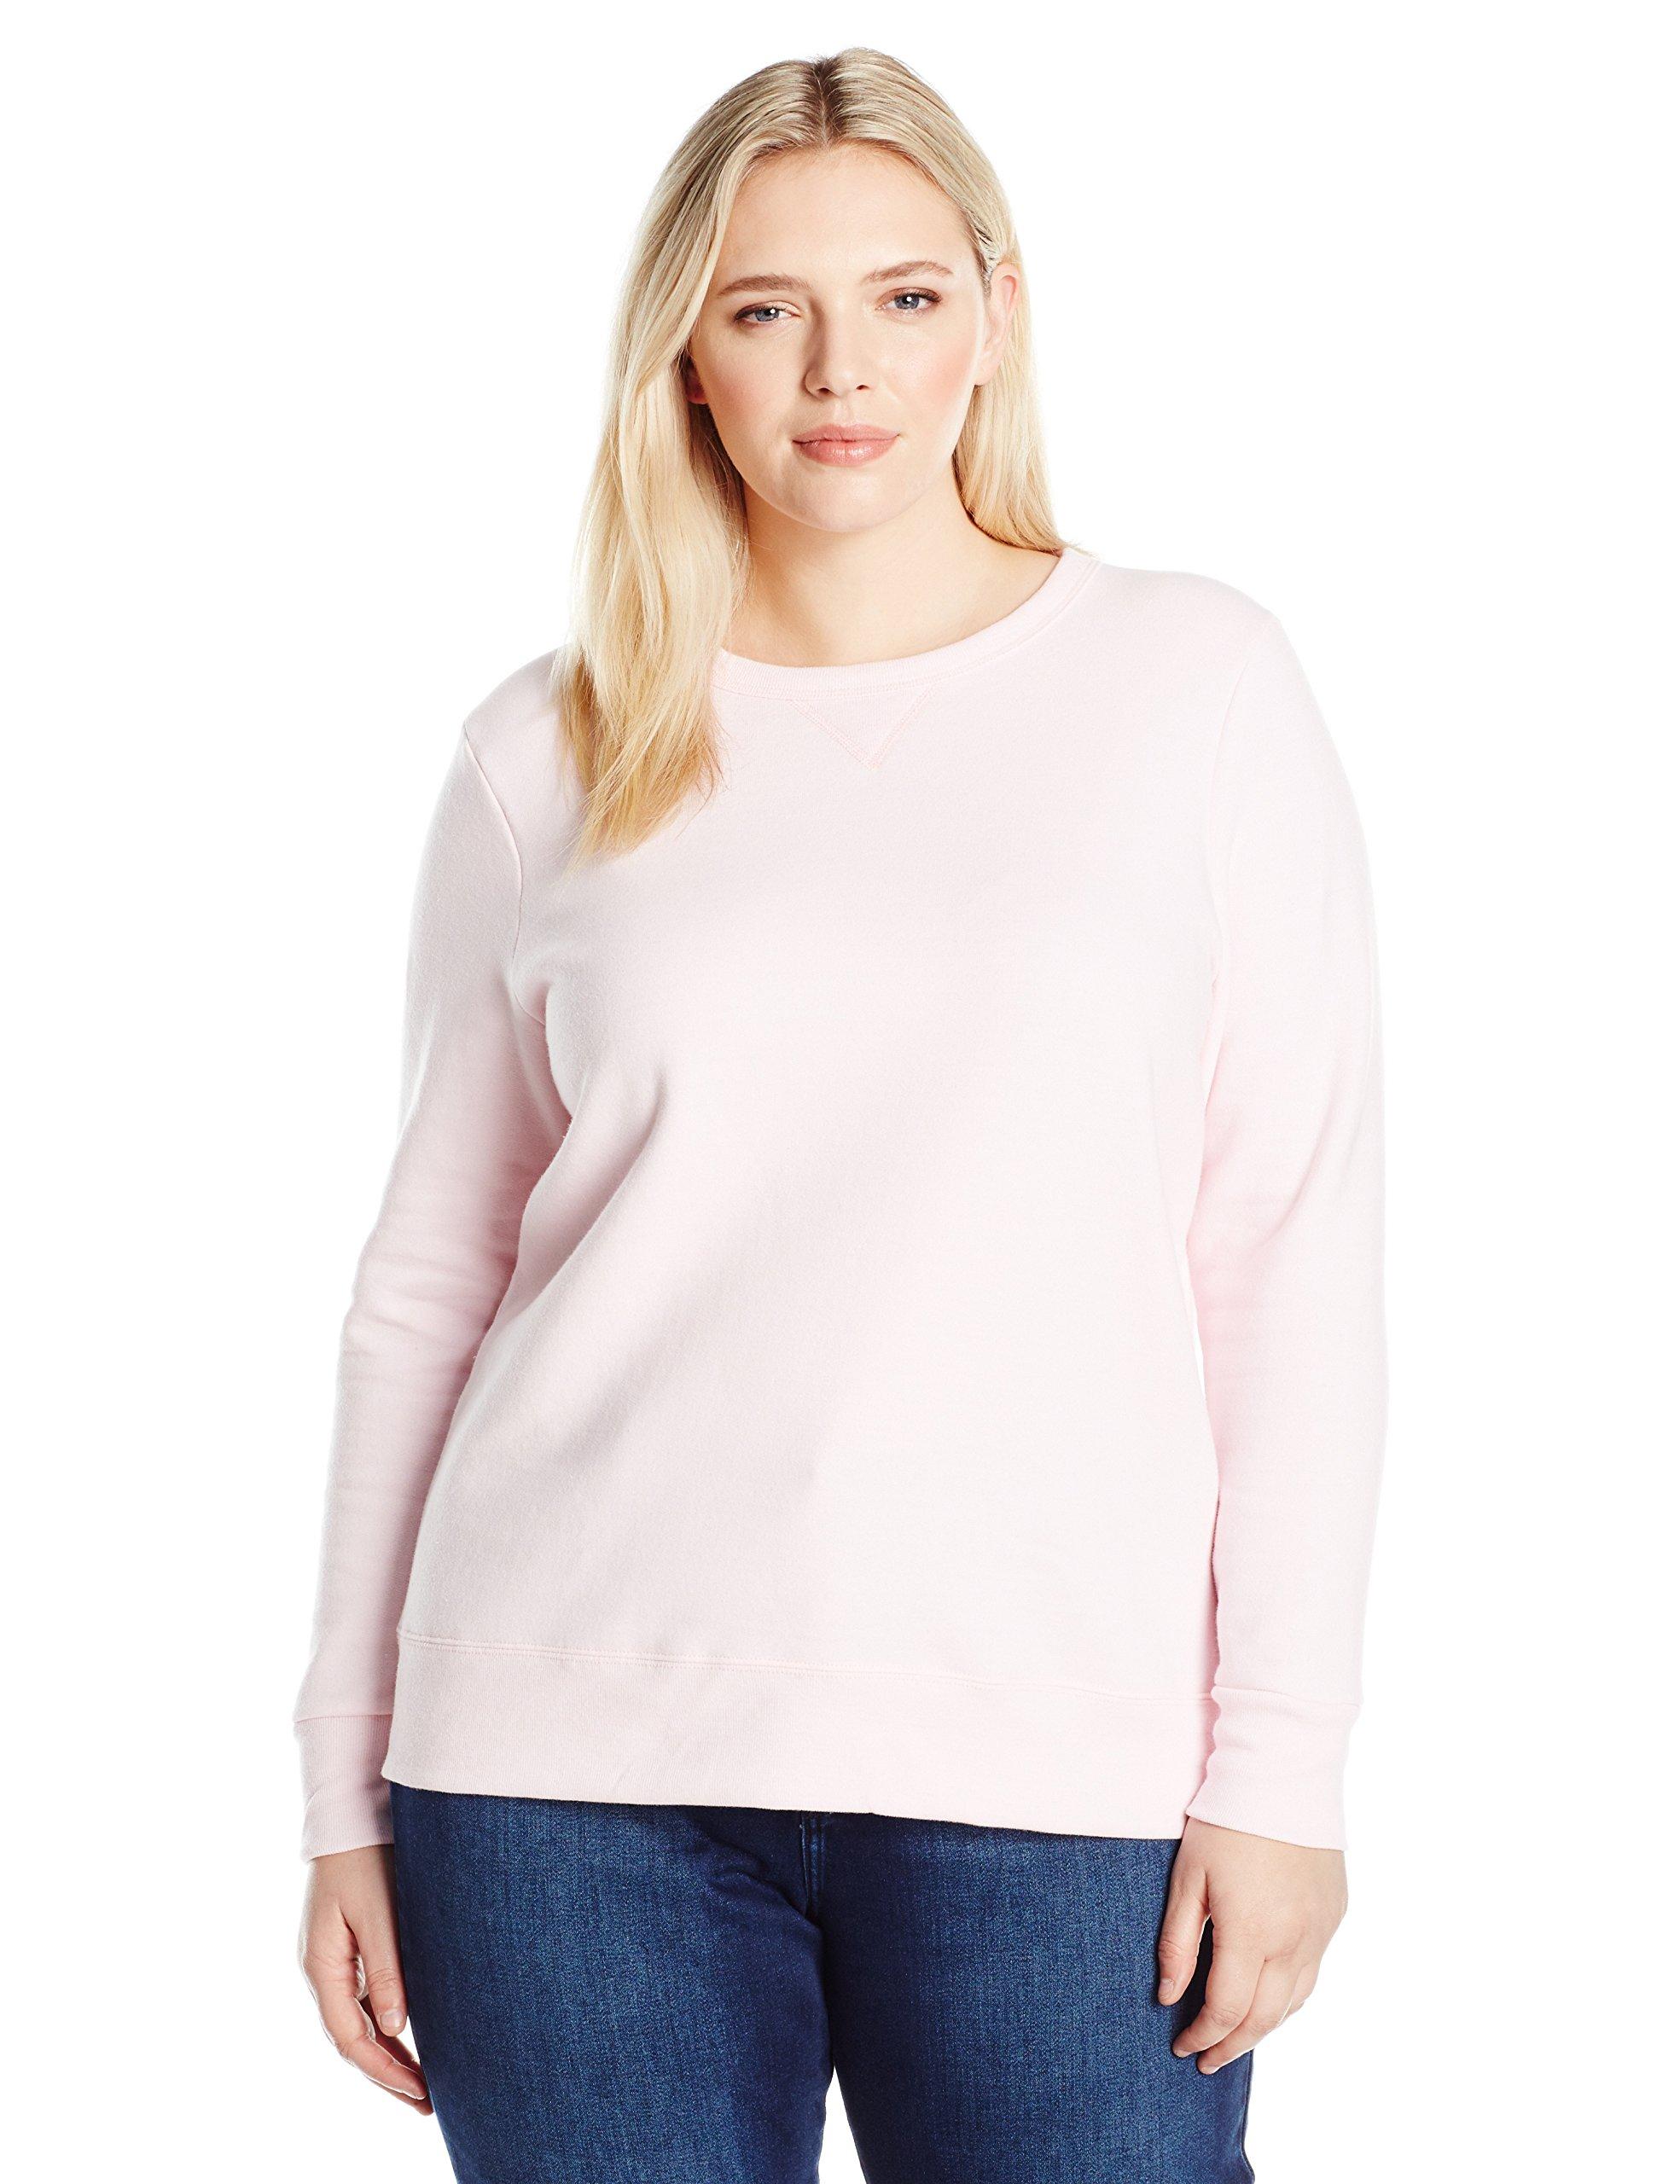 Just My Size Women's Plus V-Notch Sweatshirt, Pale Pink, 2X